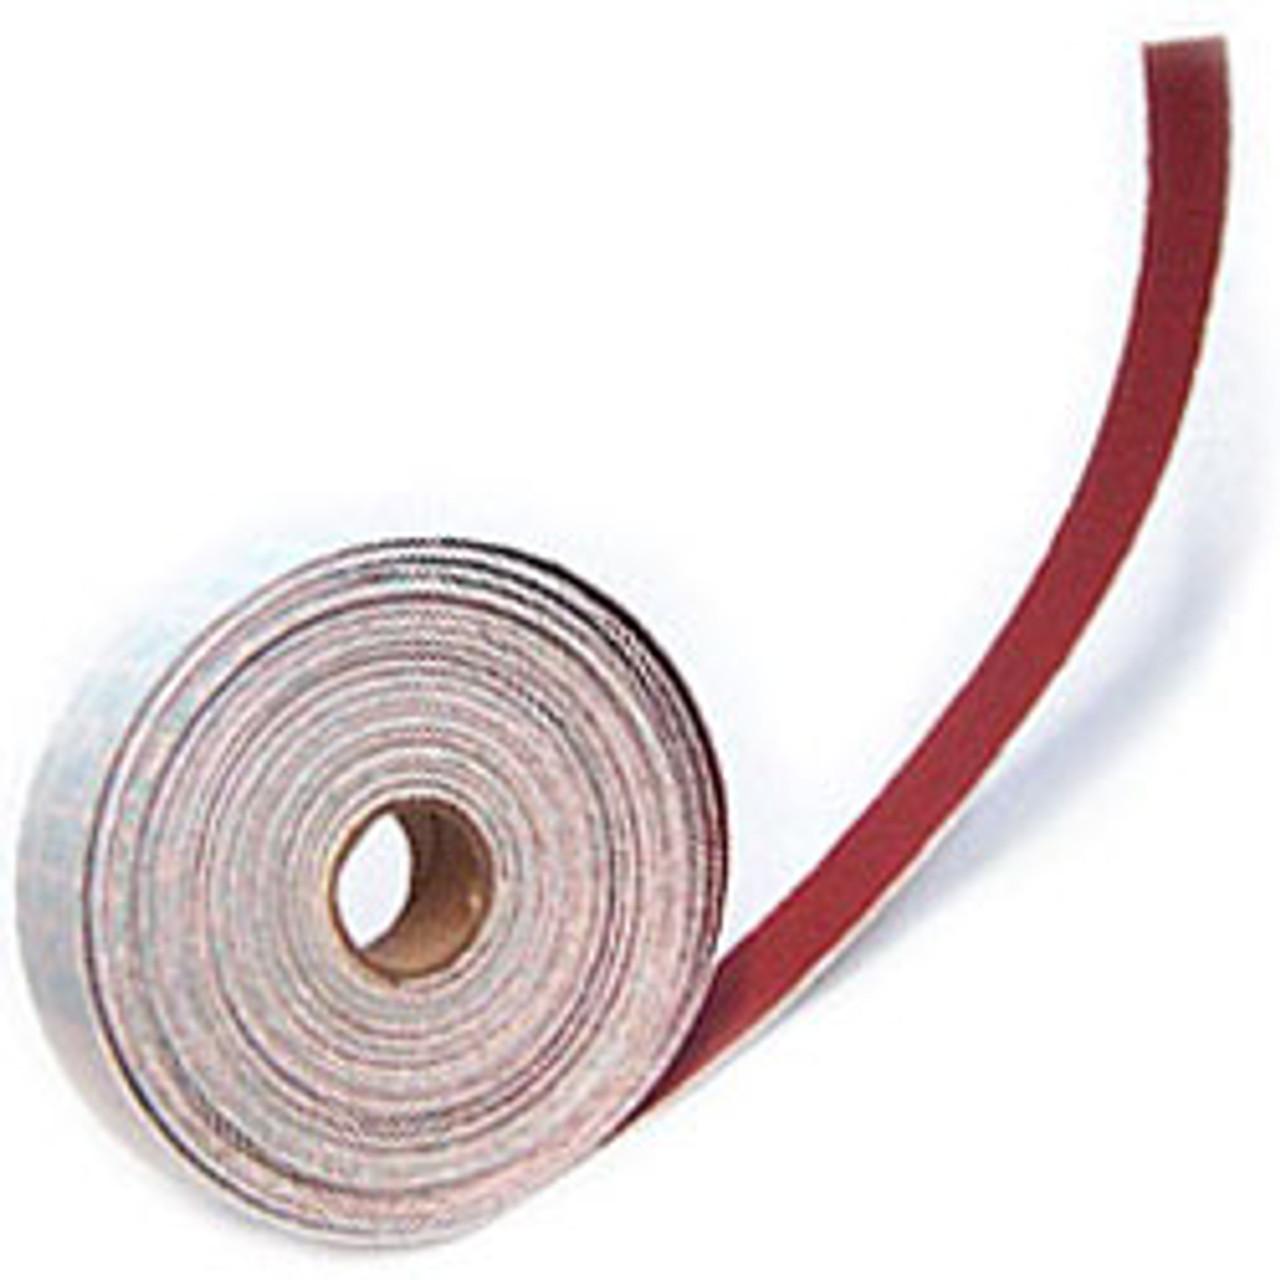 "Klingspor Abrasives Heavyweight Aluminum Oxide, 1-1/8""x 10 Meter (33') Hook & Loop Roll, 180 Grit"